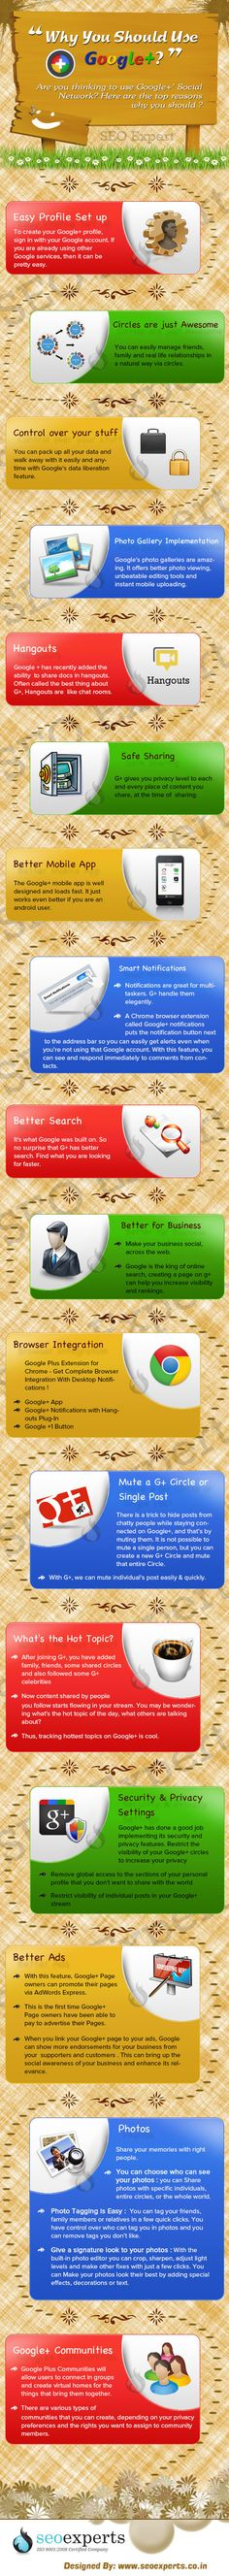 Top Reasons to Use Google+ Social Network